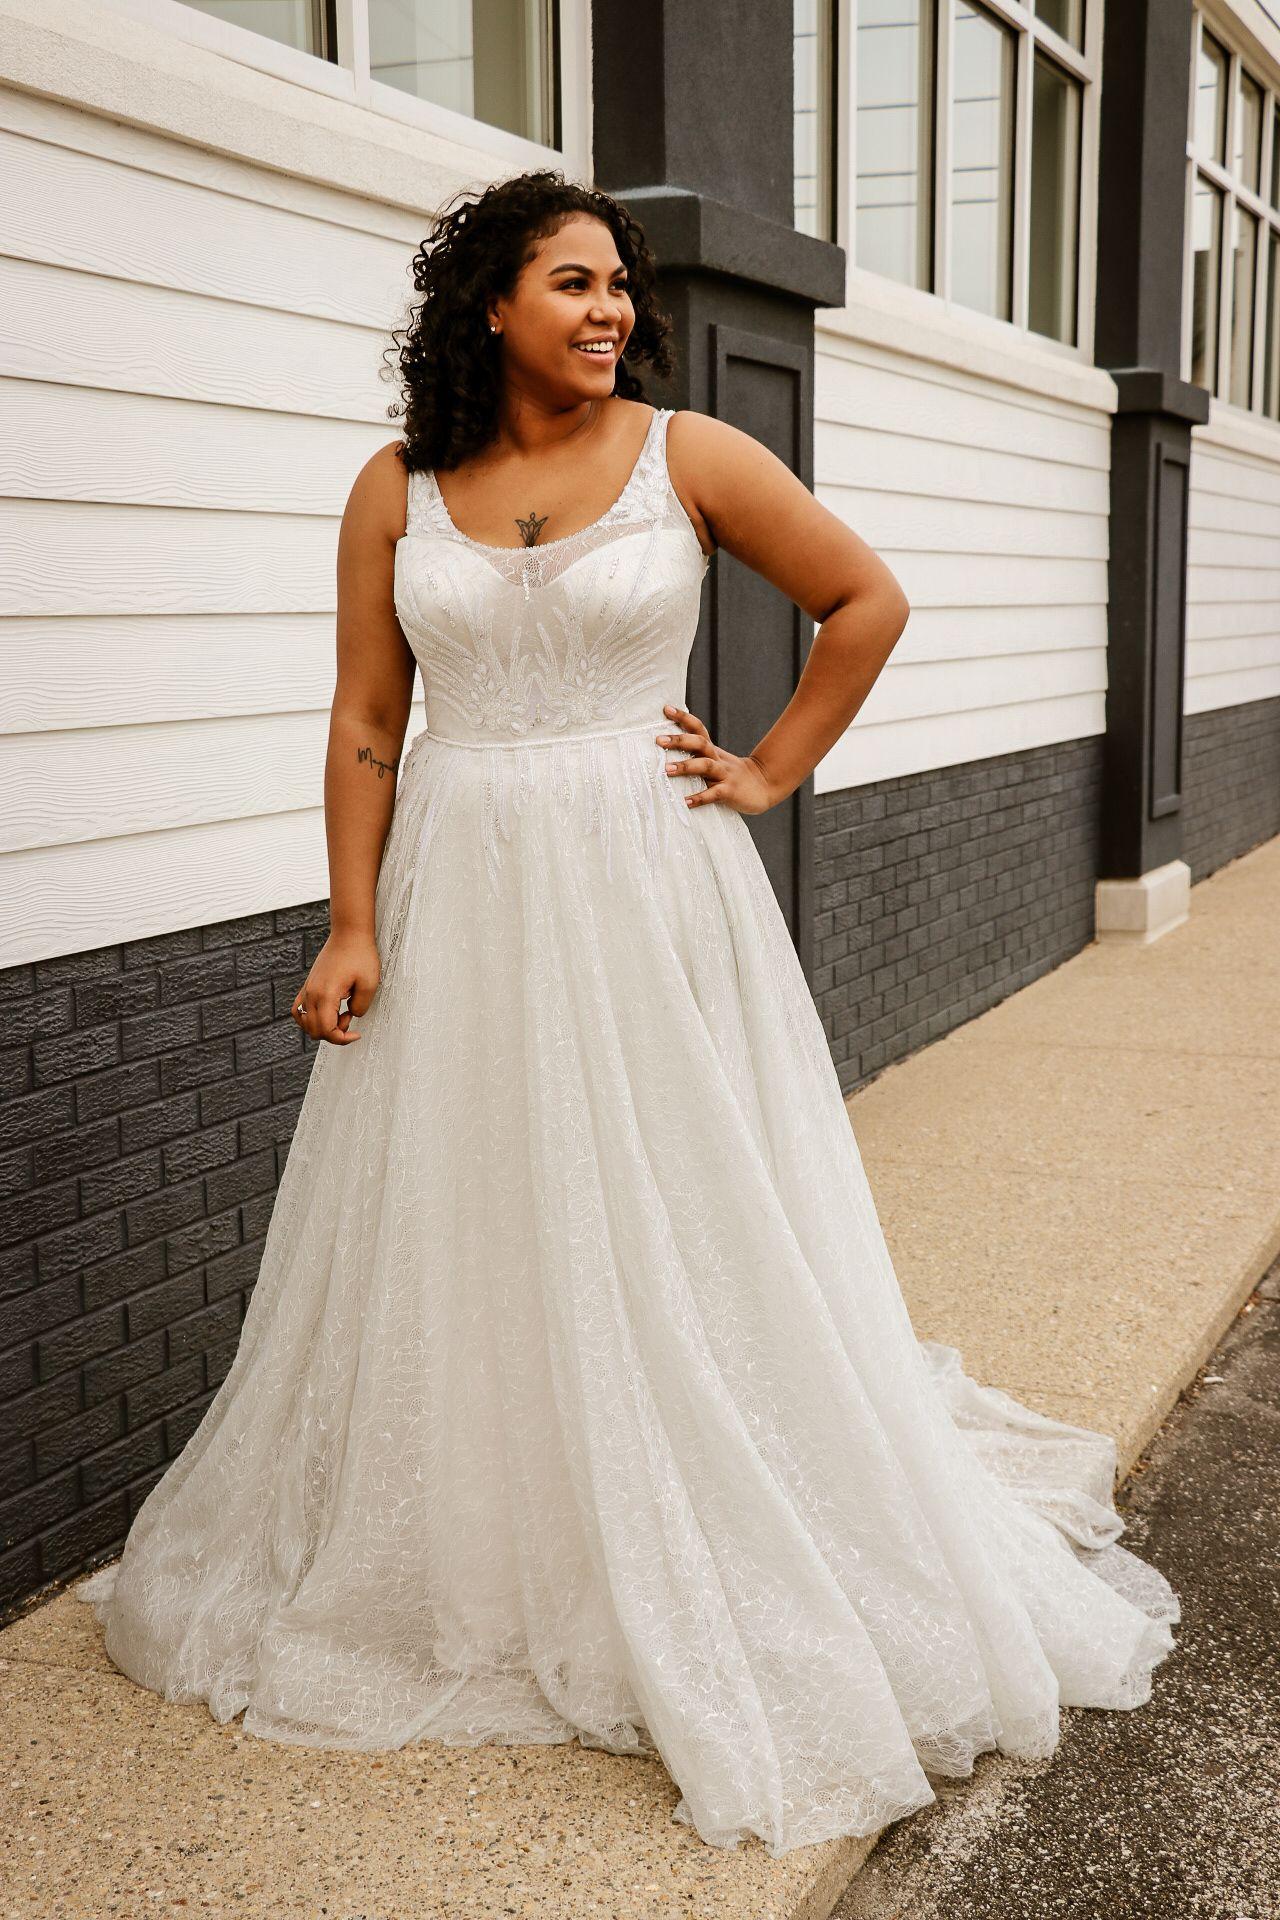 white wedding dress backless wedding dress long